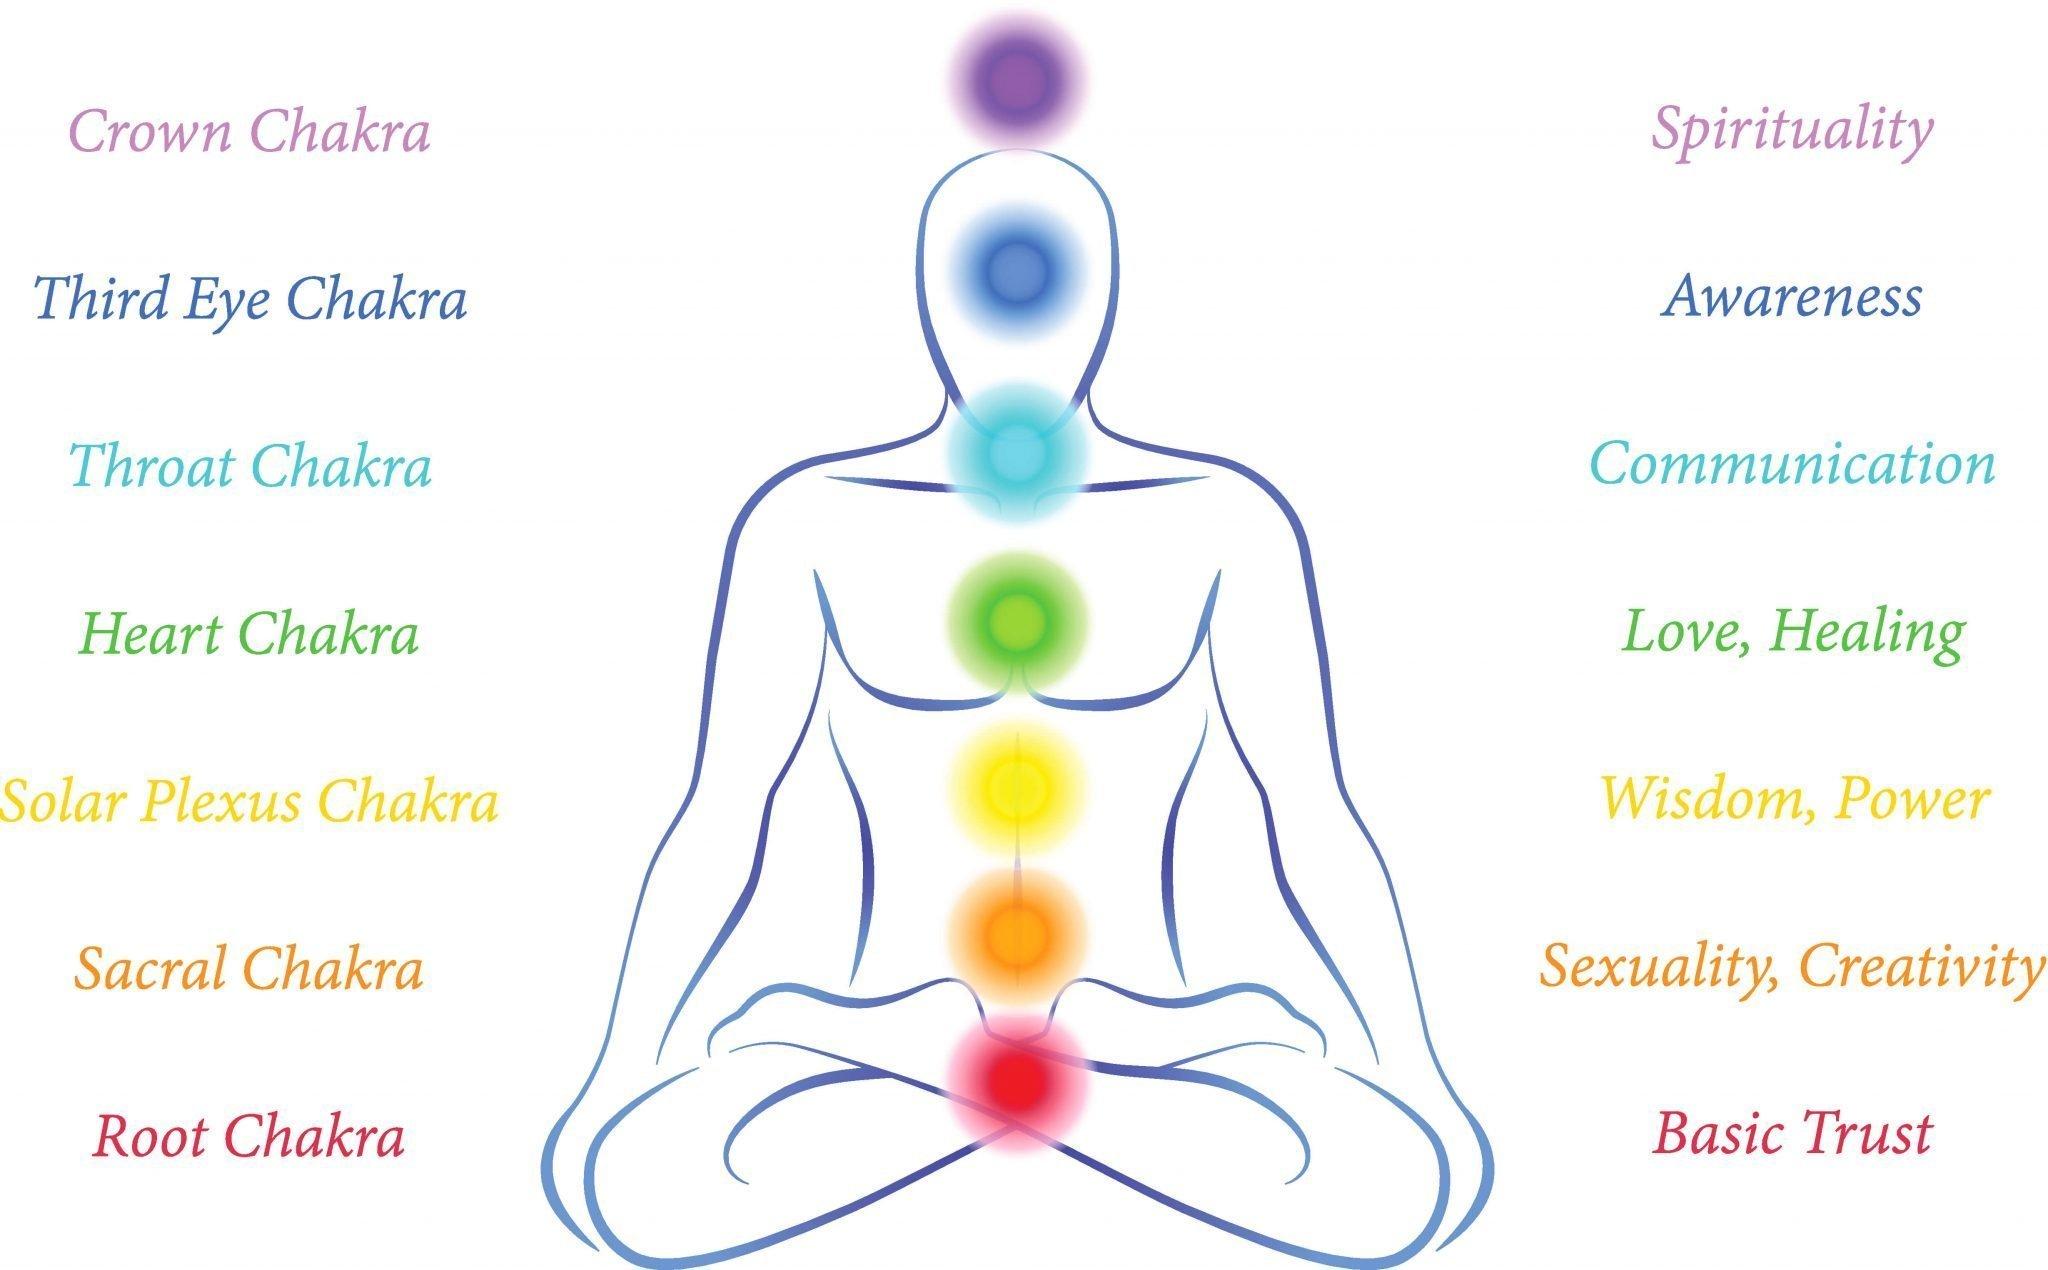 Voiceover-spirituality